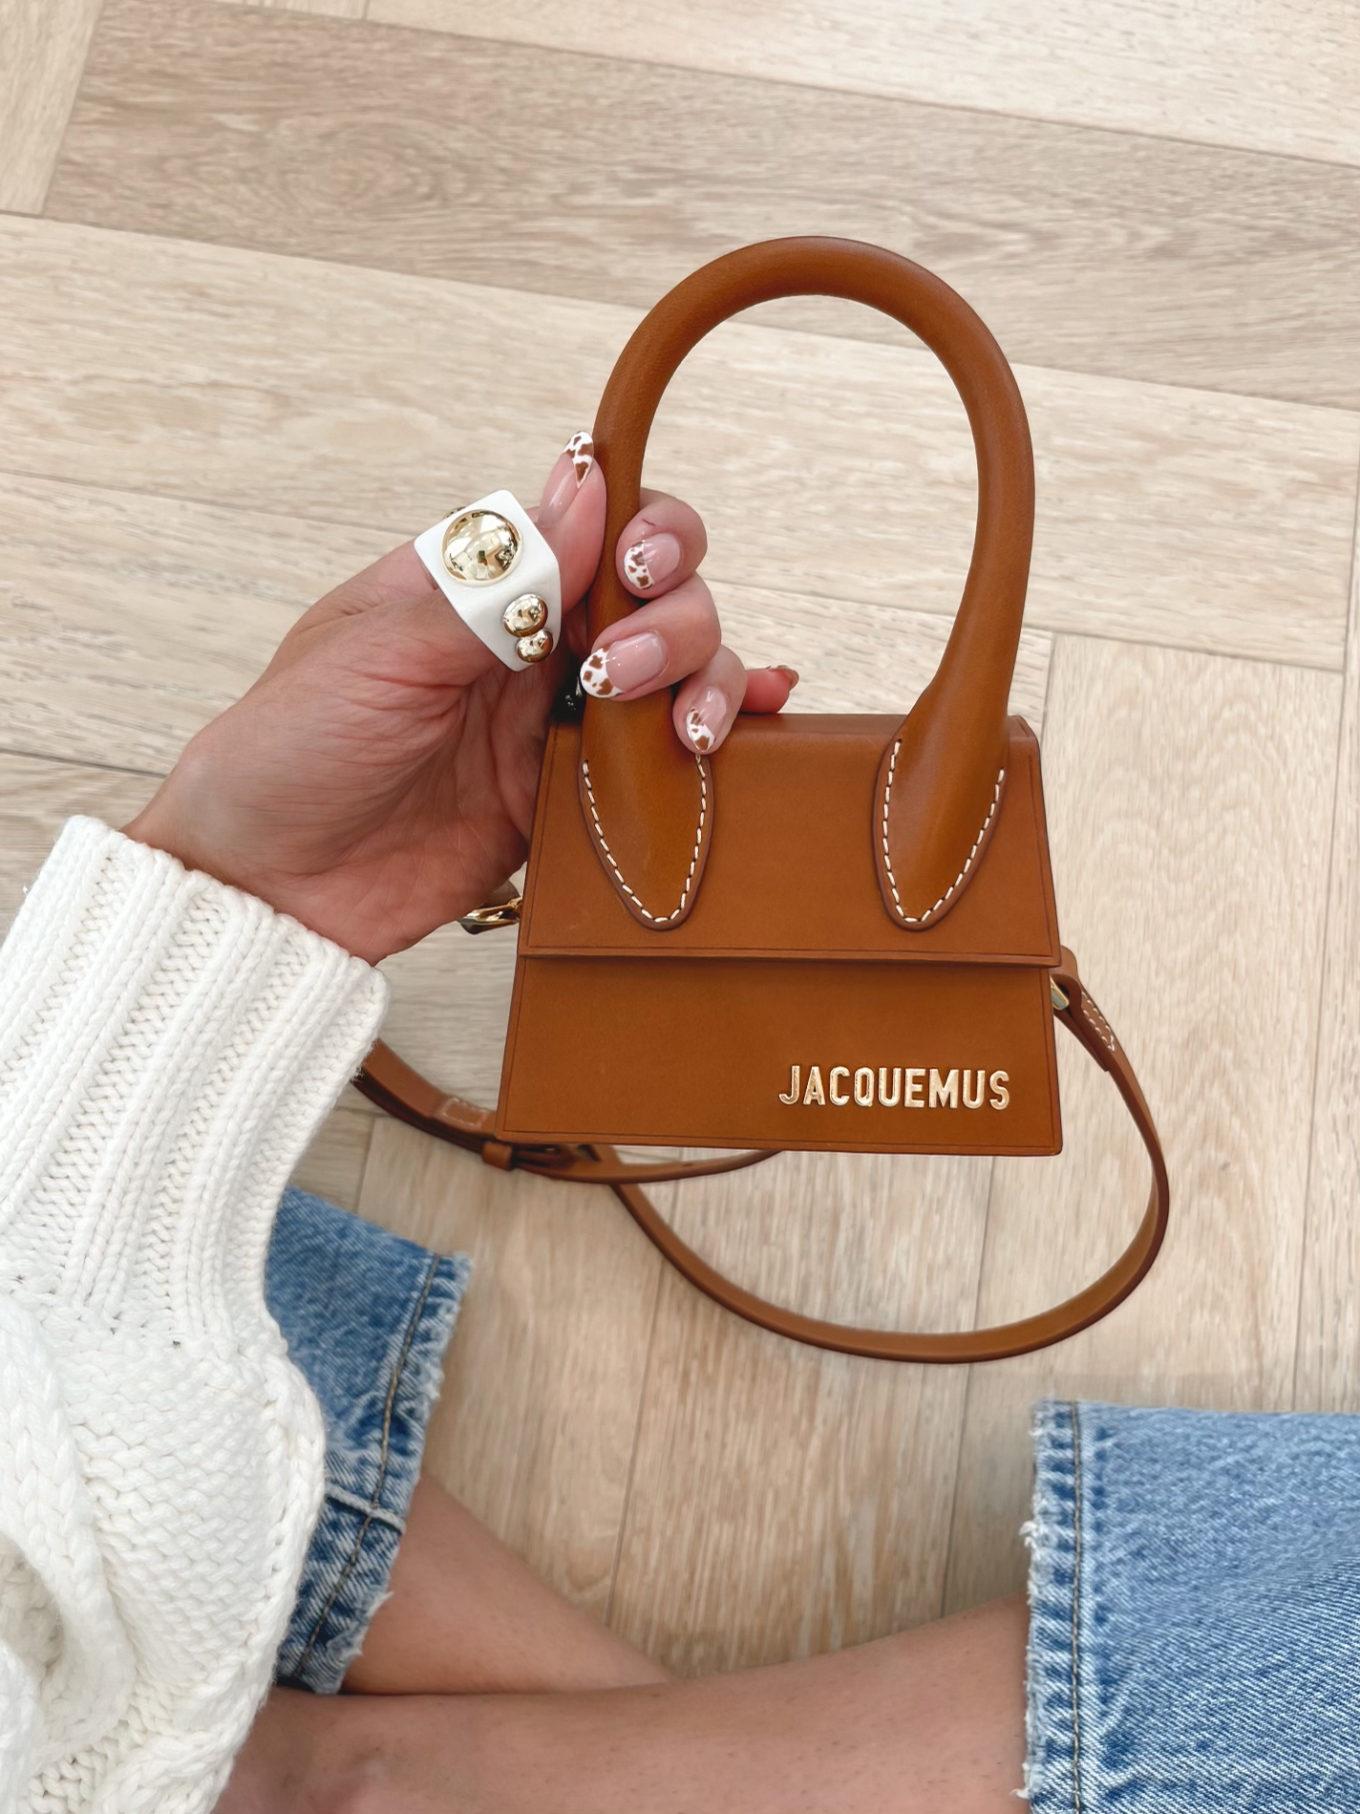 shopbop sale, sale picks, fall sale, fall fashion, shopbop